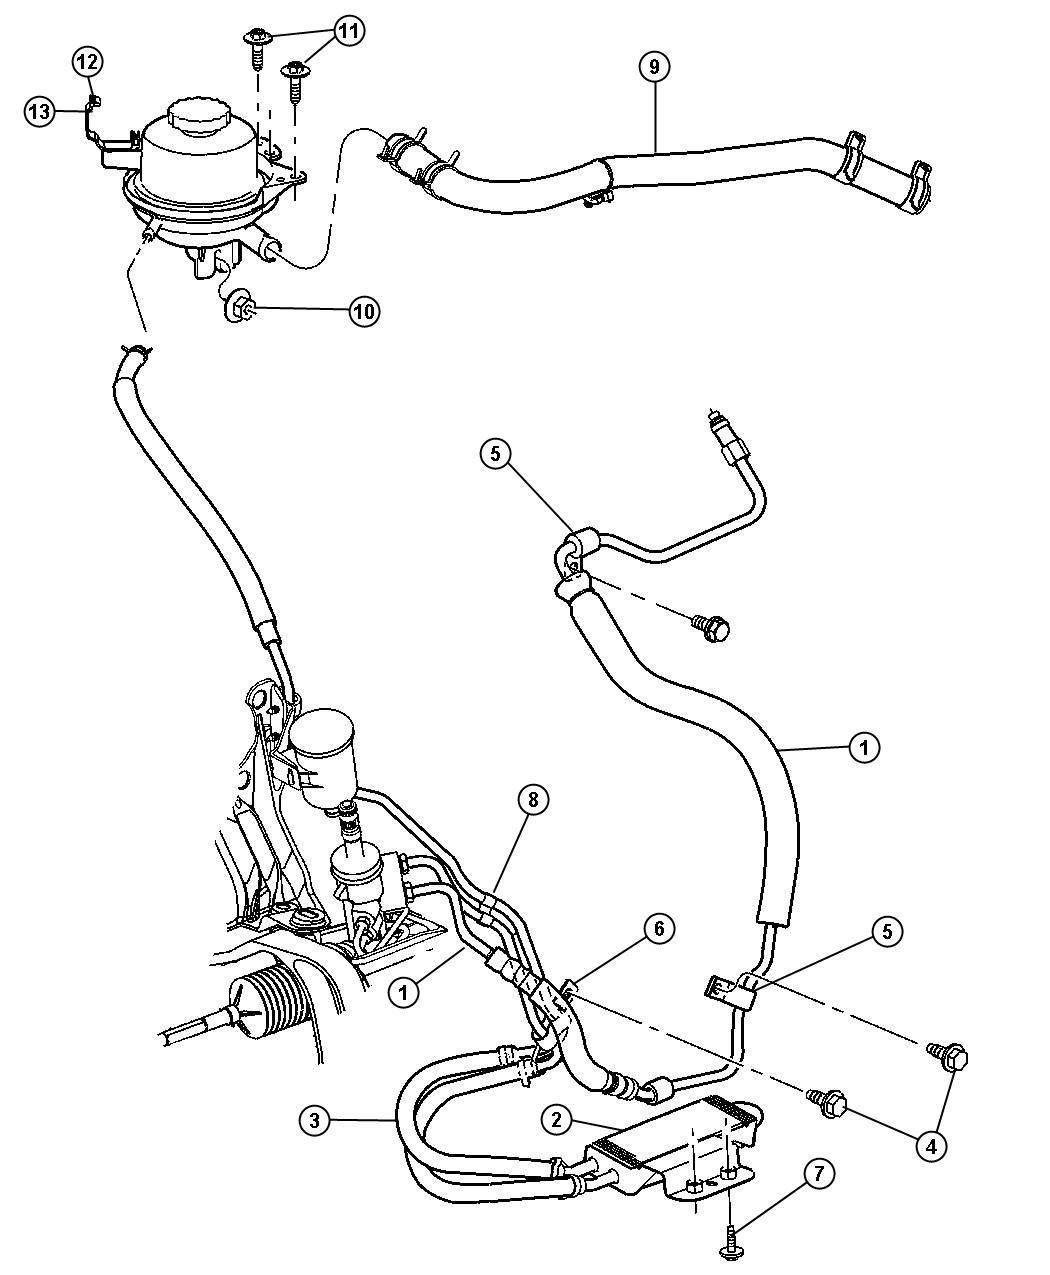 Chrysler Line Power Steering Return Pinionengine